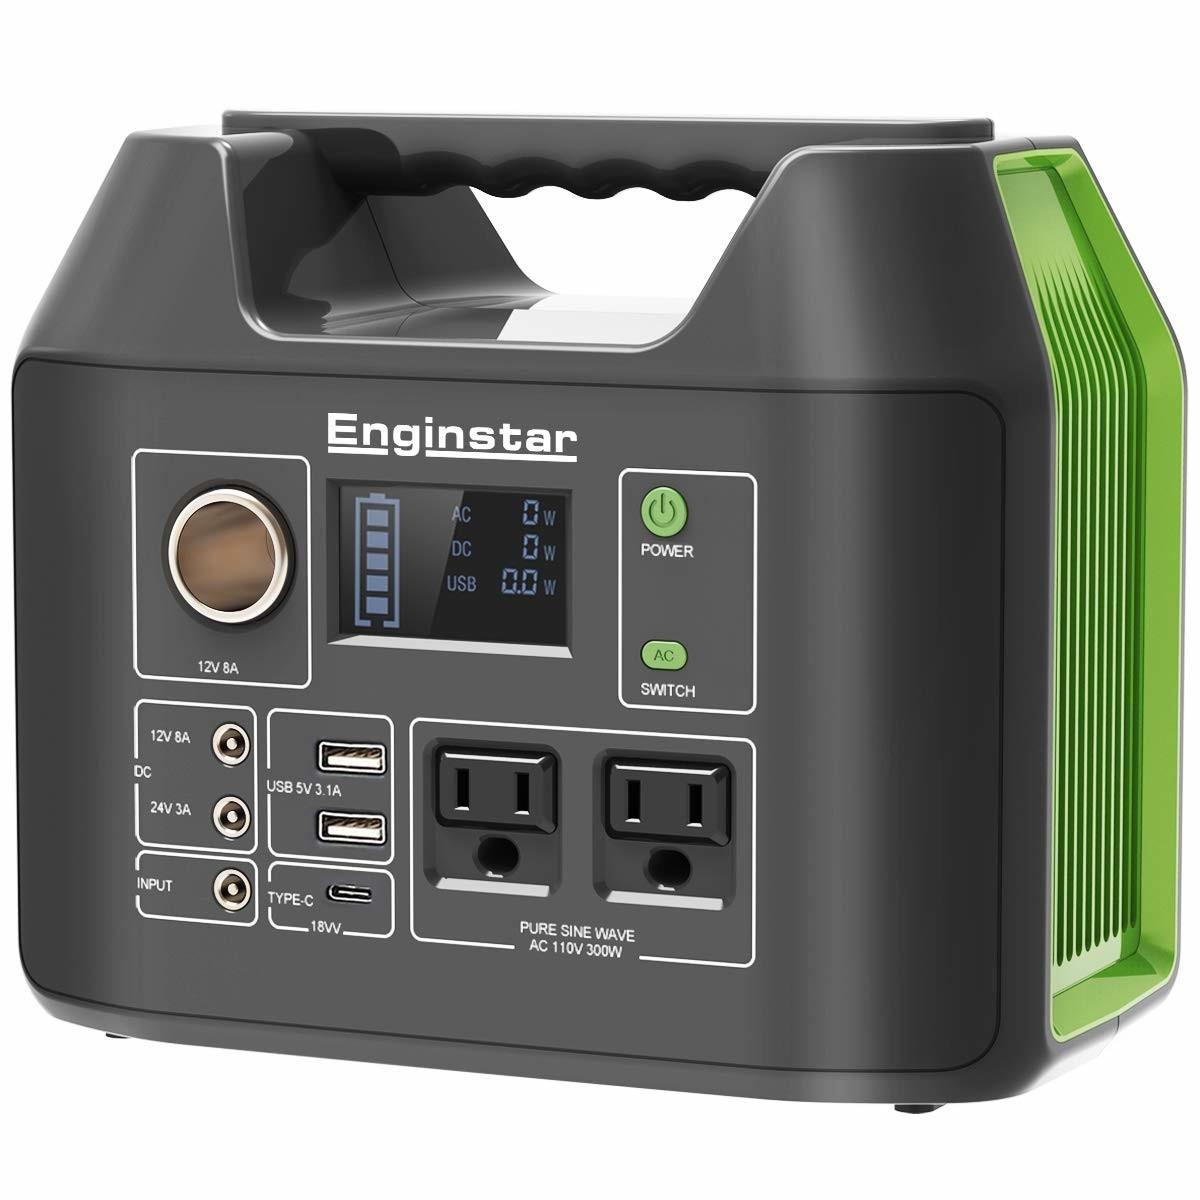 Enginstar ポータブル電源 110000mAH/407Wh